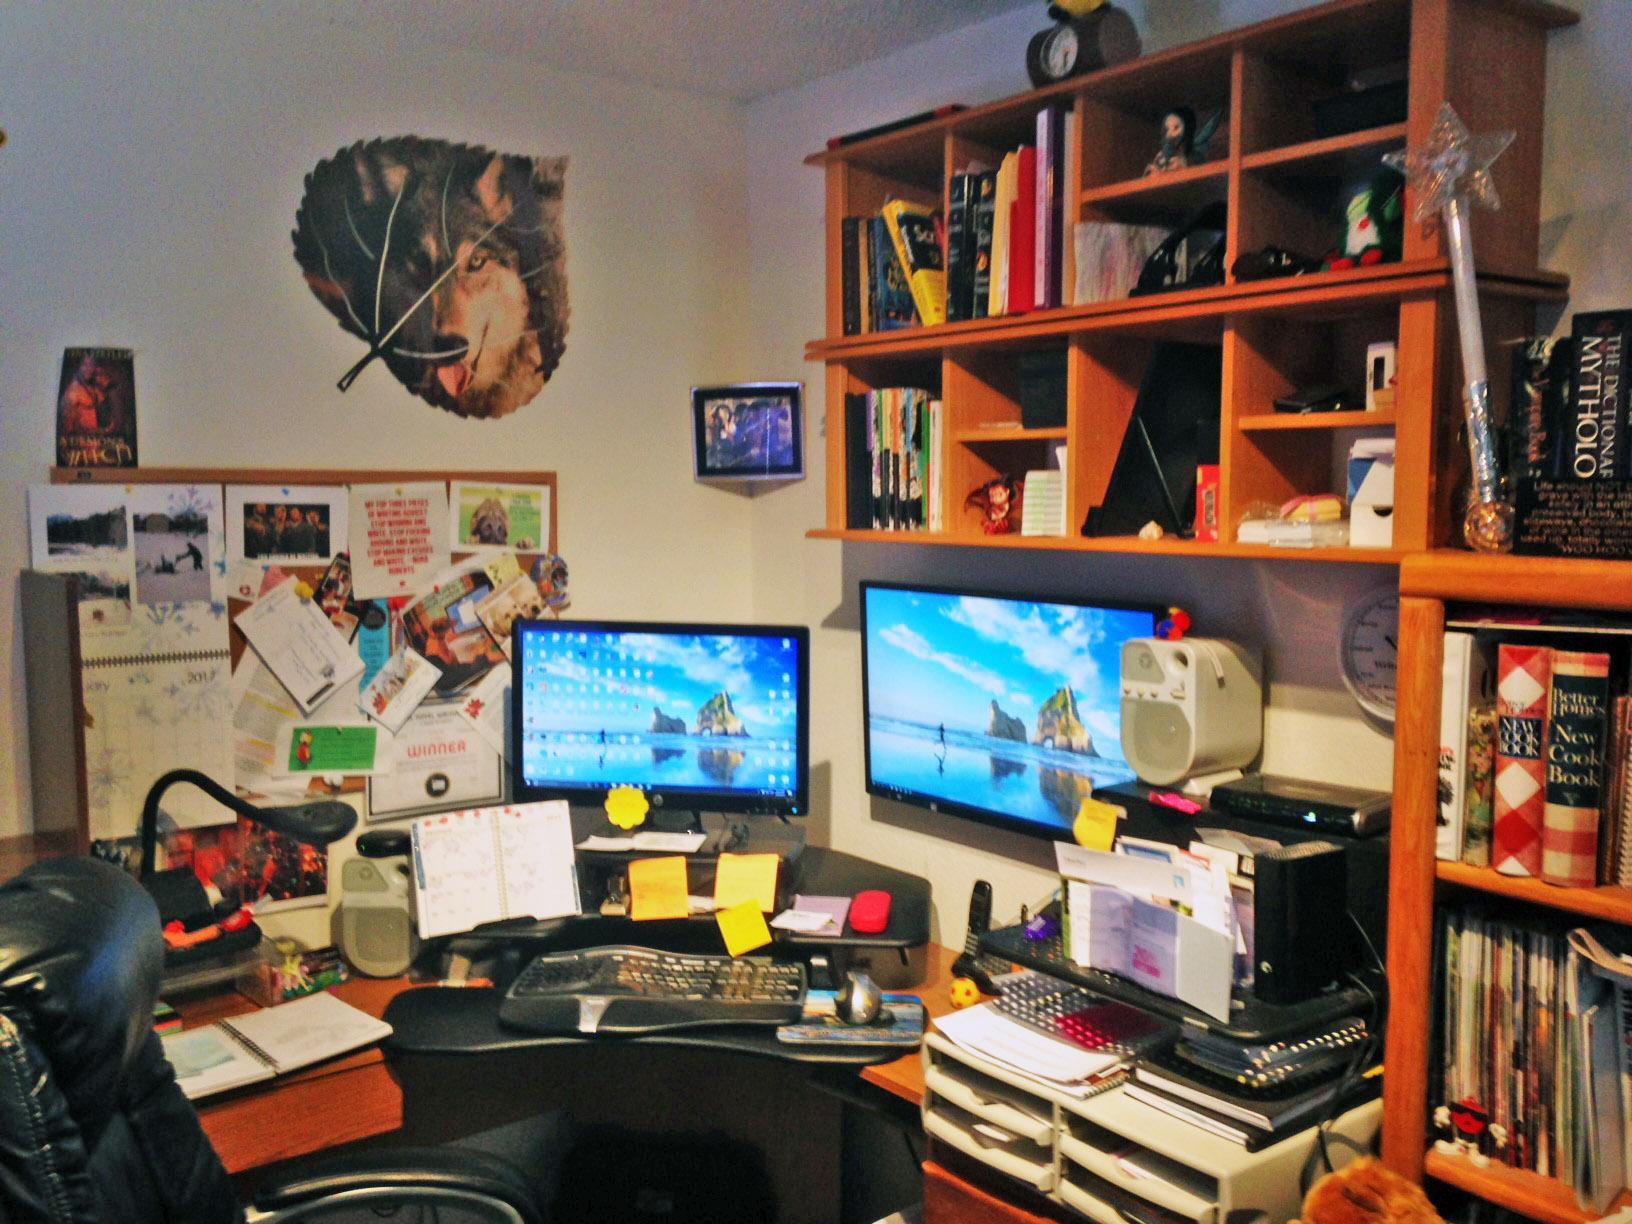 Tena's work cave